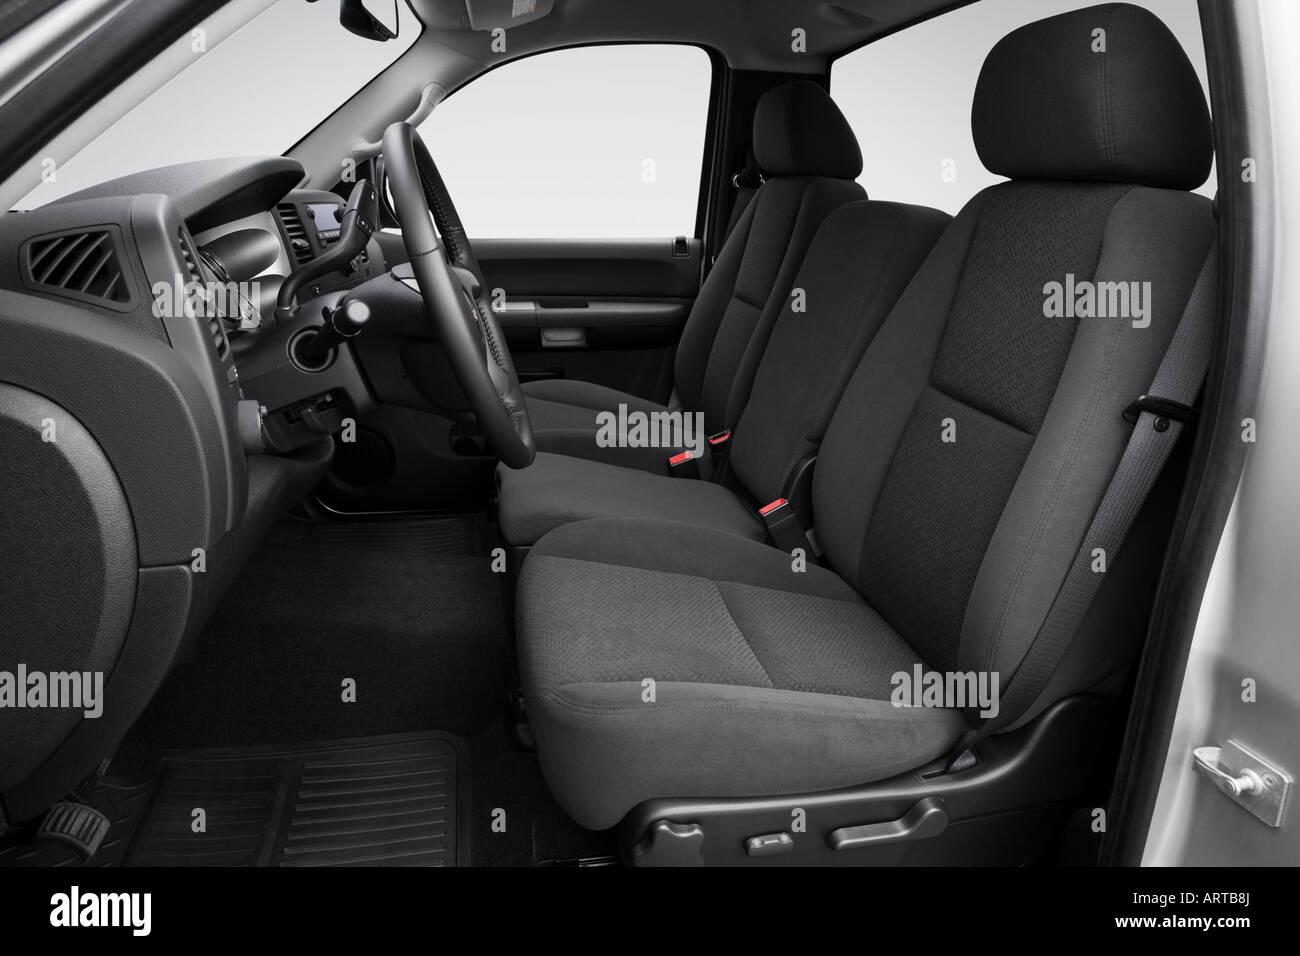 hight resolution of 2008 gmc sierra 2500hd sle in silver front seats